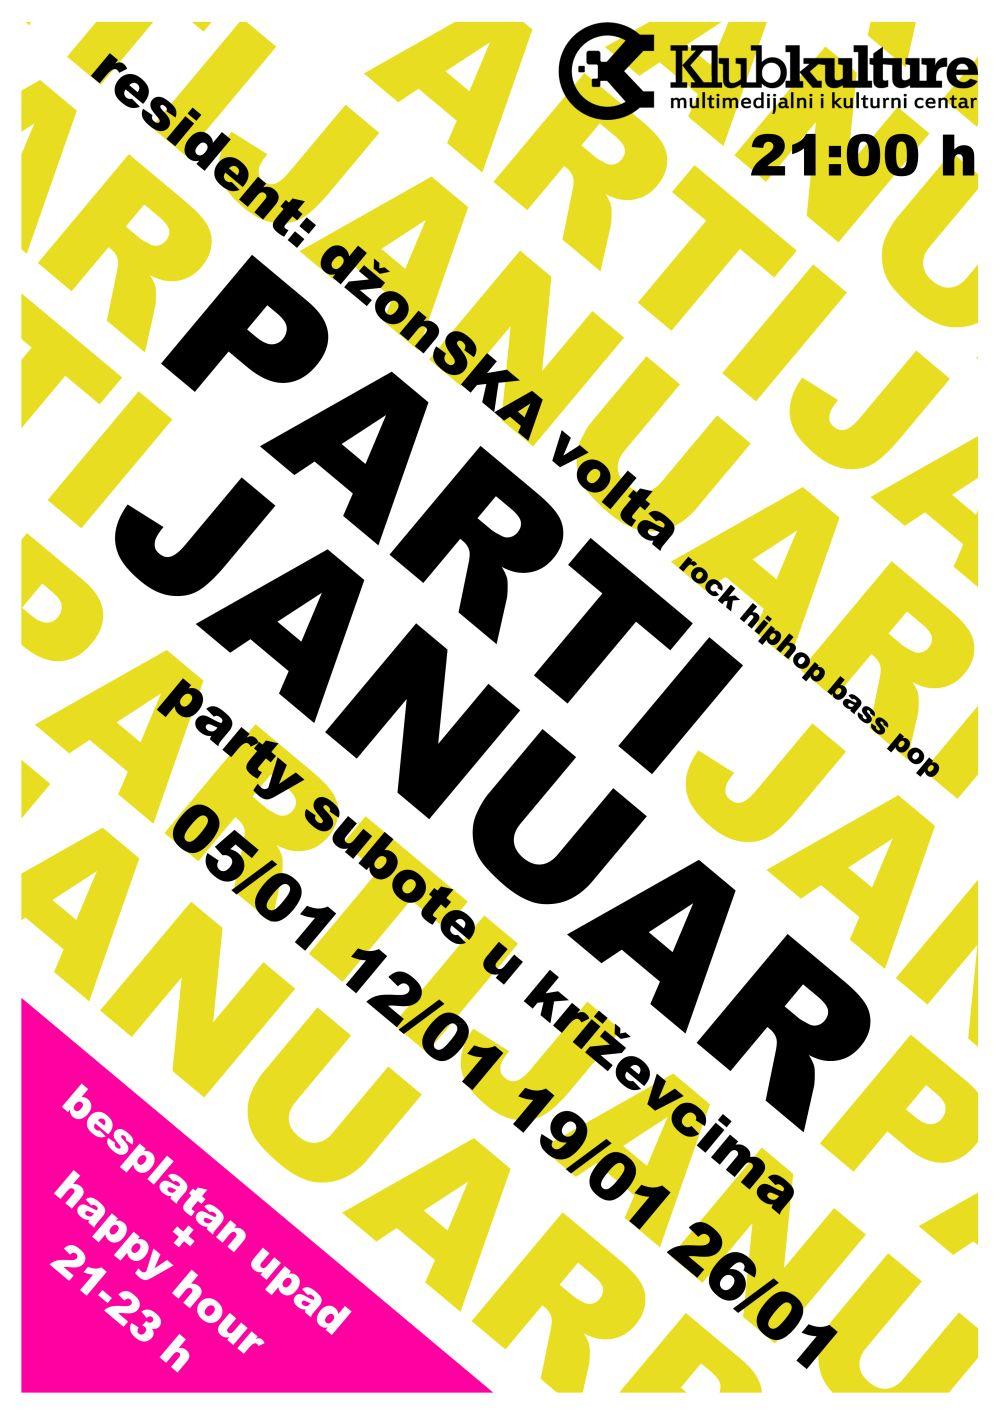 Klub kulture - Partijanuar 2013 NET